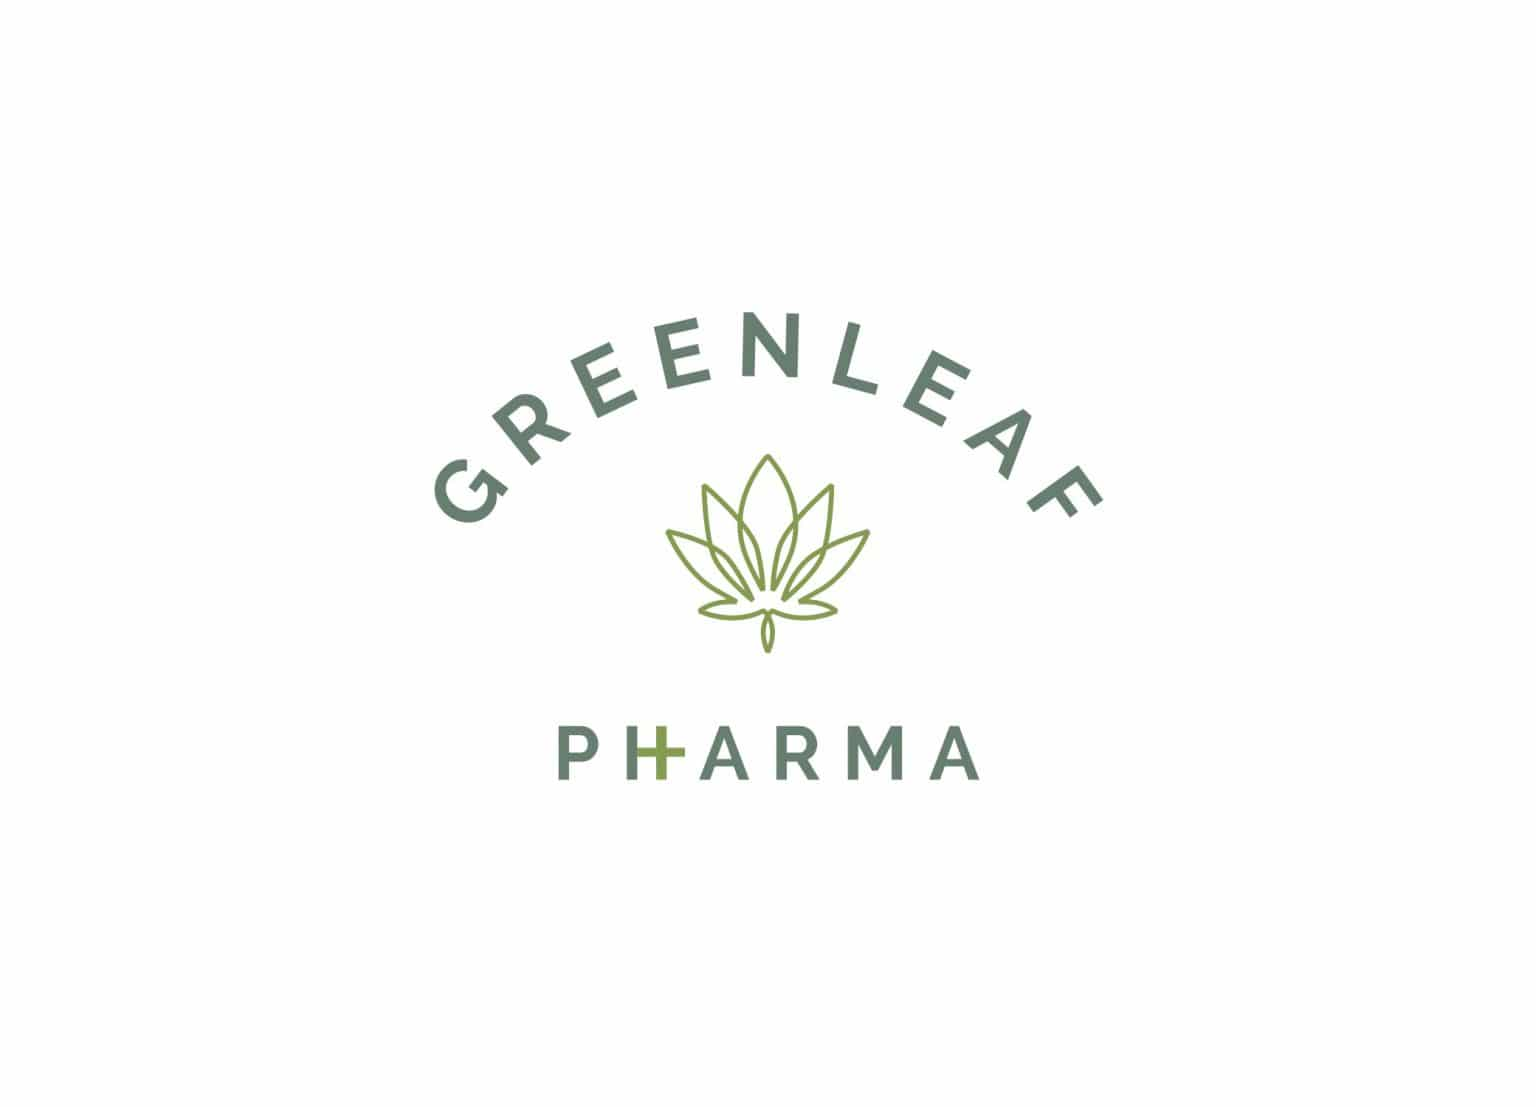 GreenLeaf Pharma medical cannabis branding retro apothecary logo design with marijuana leaf icon and sans serif font.